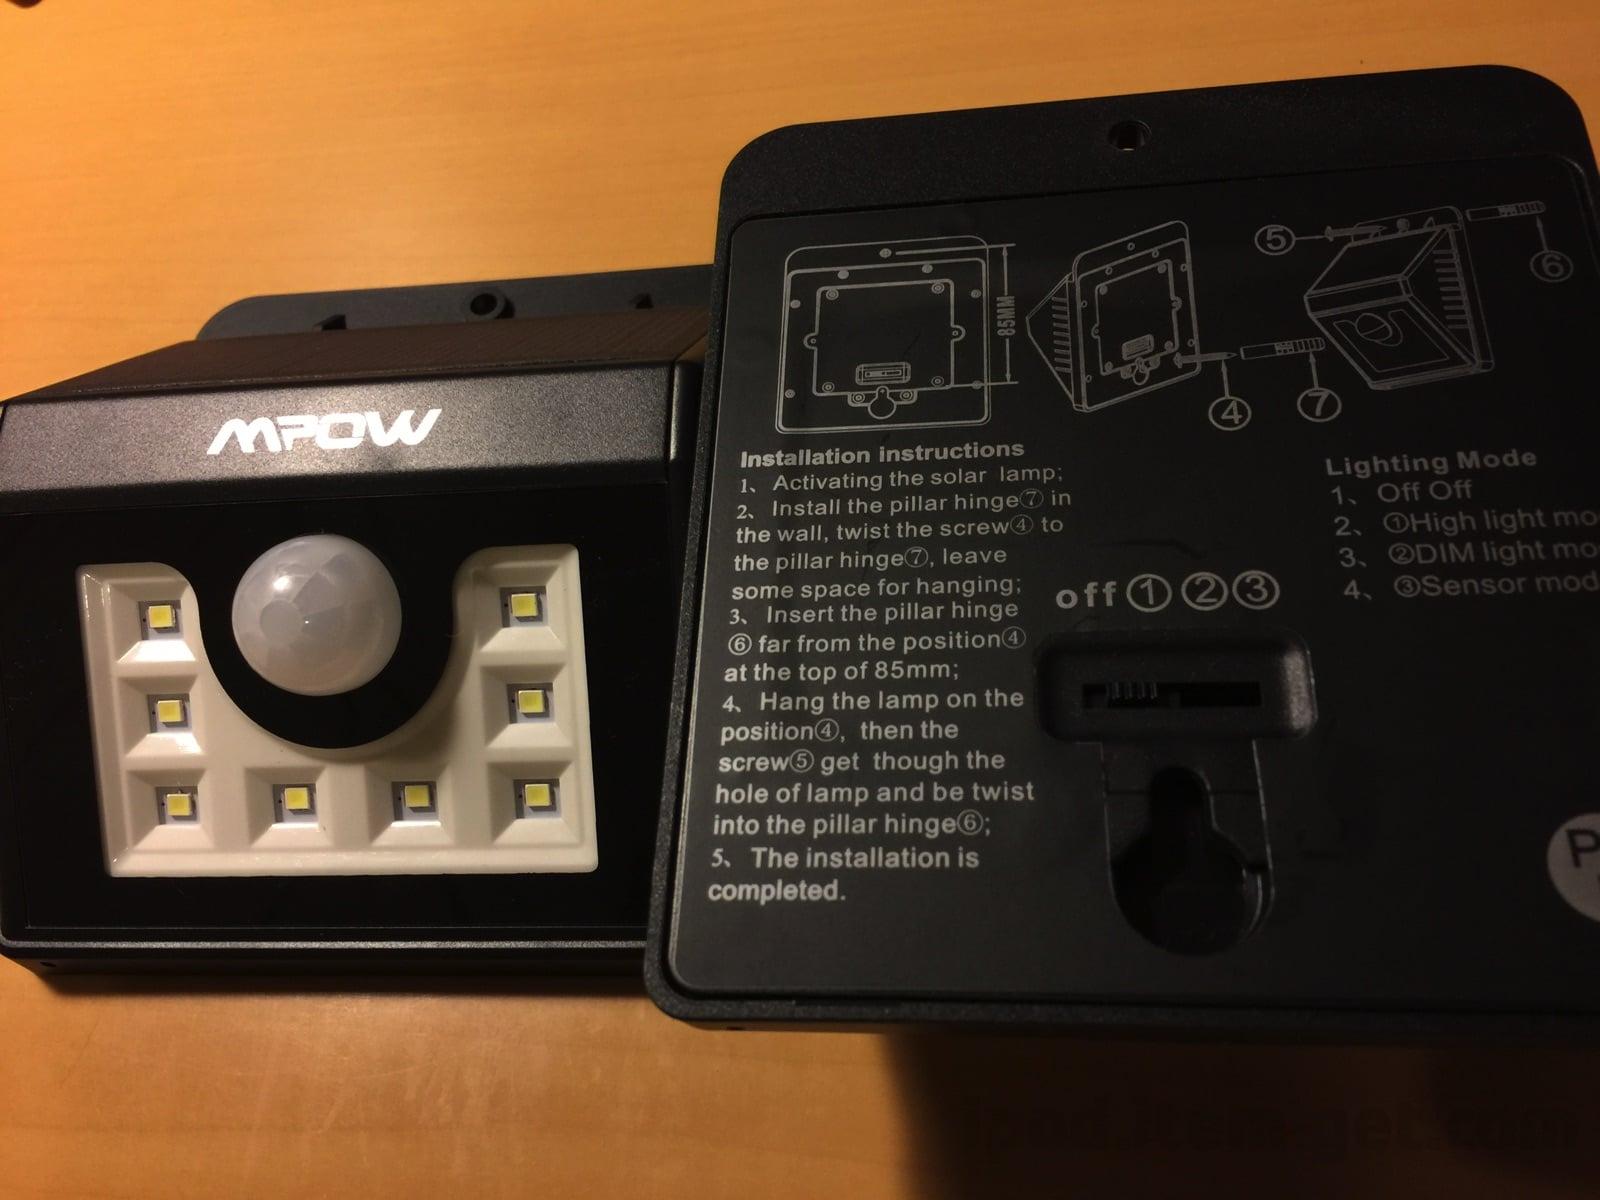 Mpow LEDLightMod 02